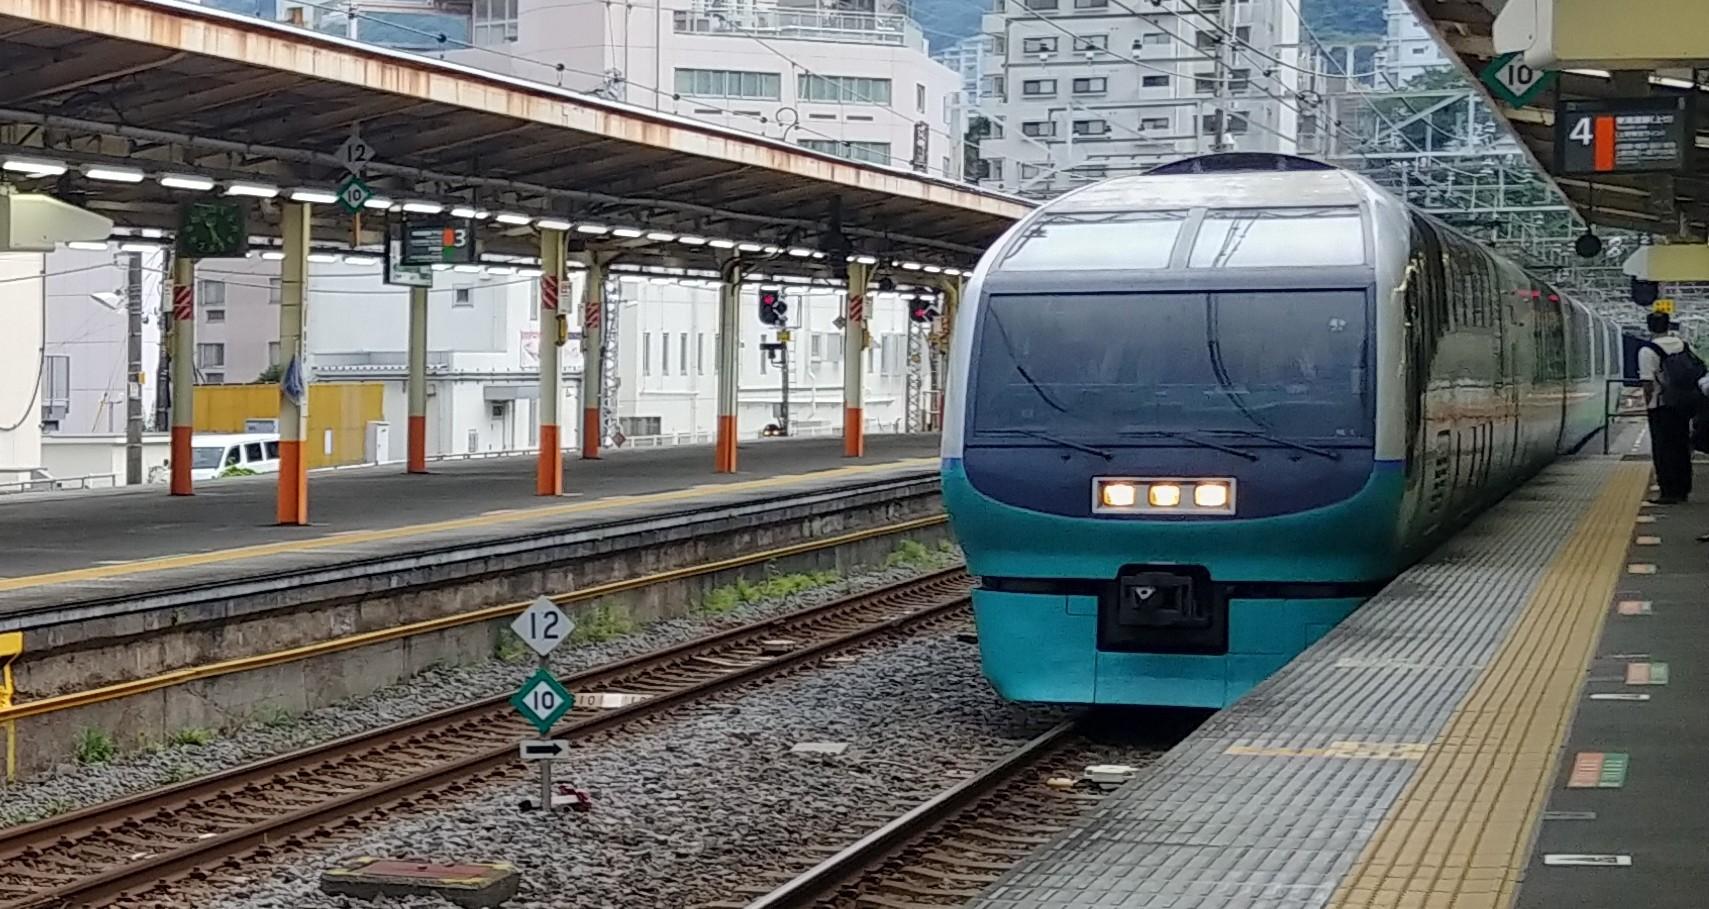 f:id:kishuji-kaisoku:20191221034340j:image